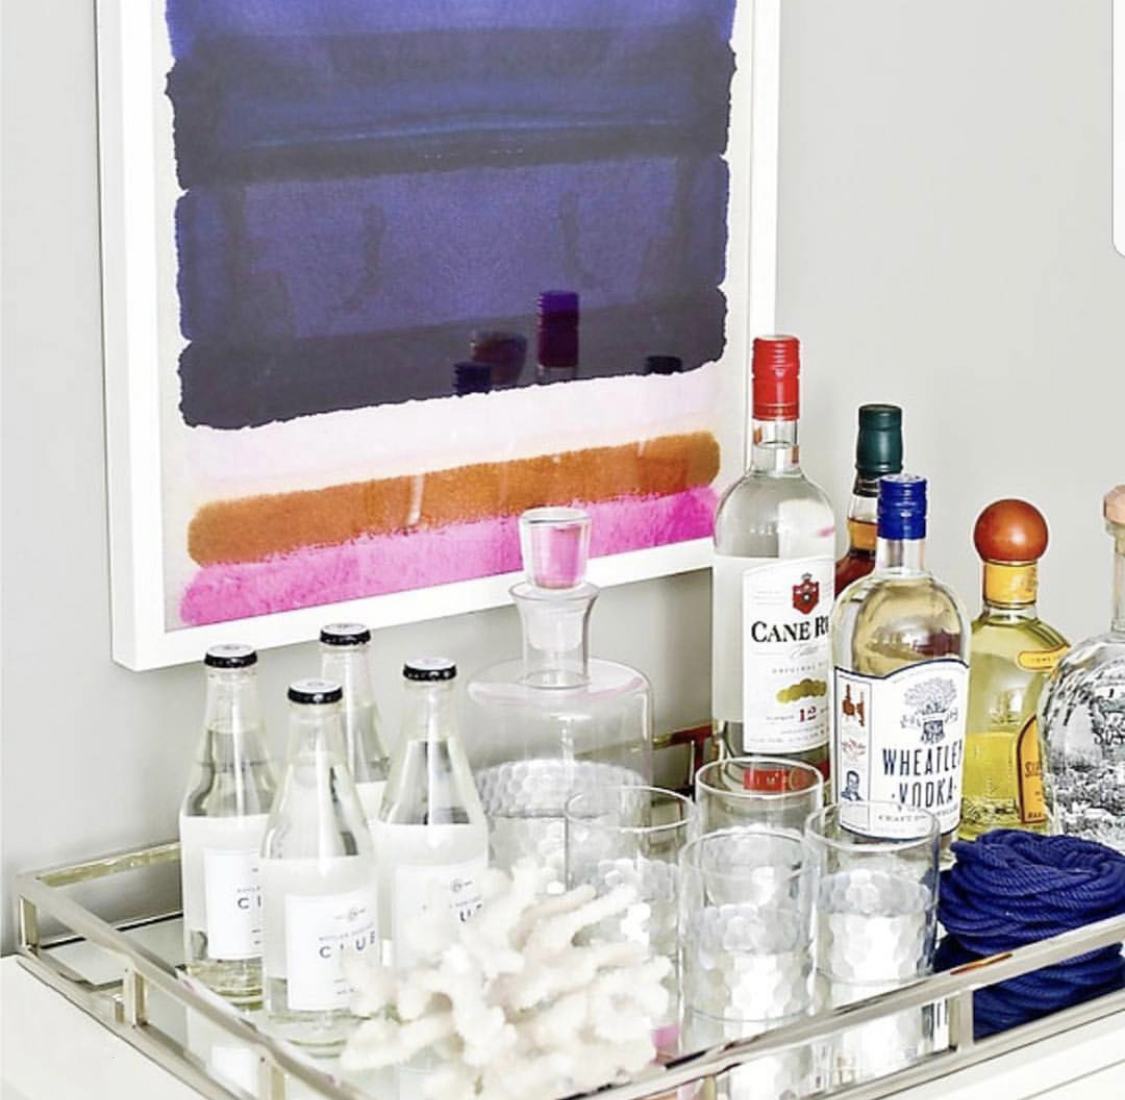 Kristi-Kohut-fine-art-in-homes-collector-reviews653.jpg